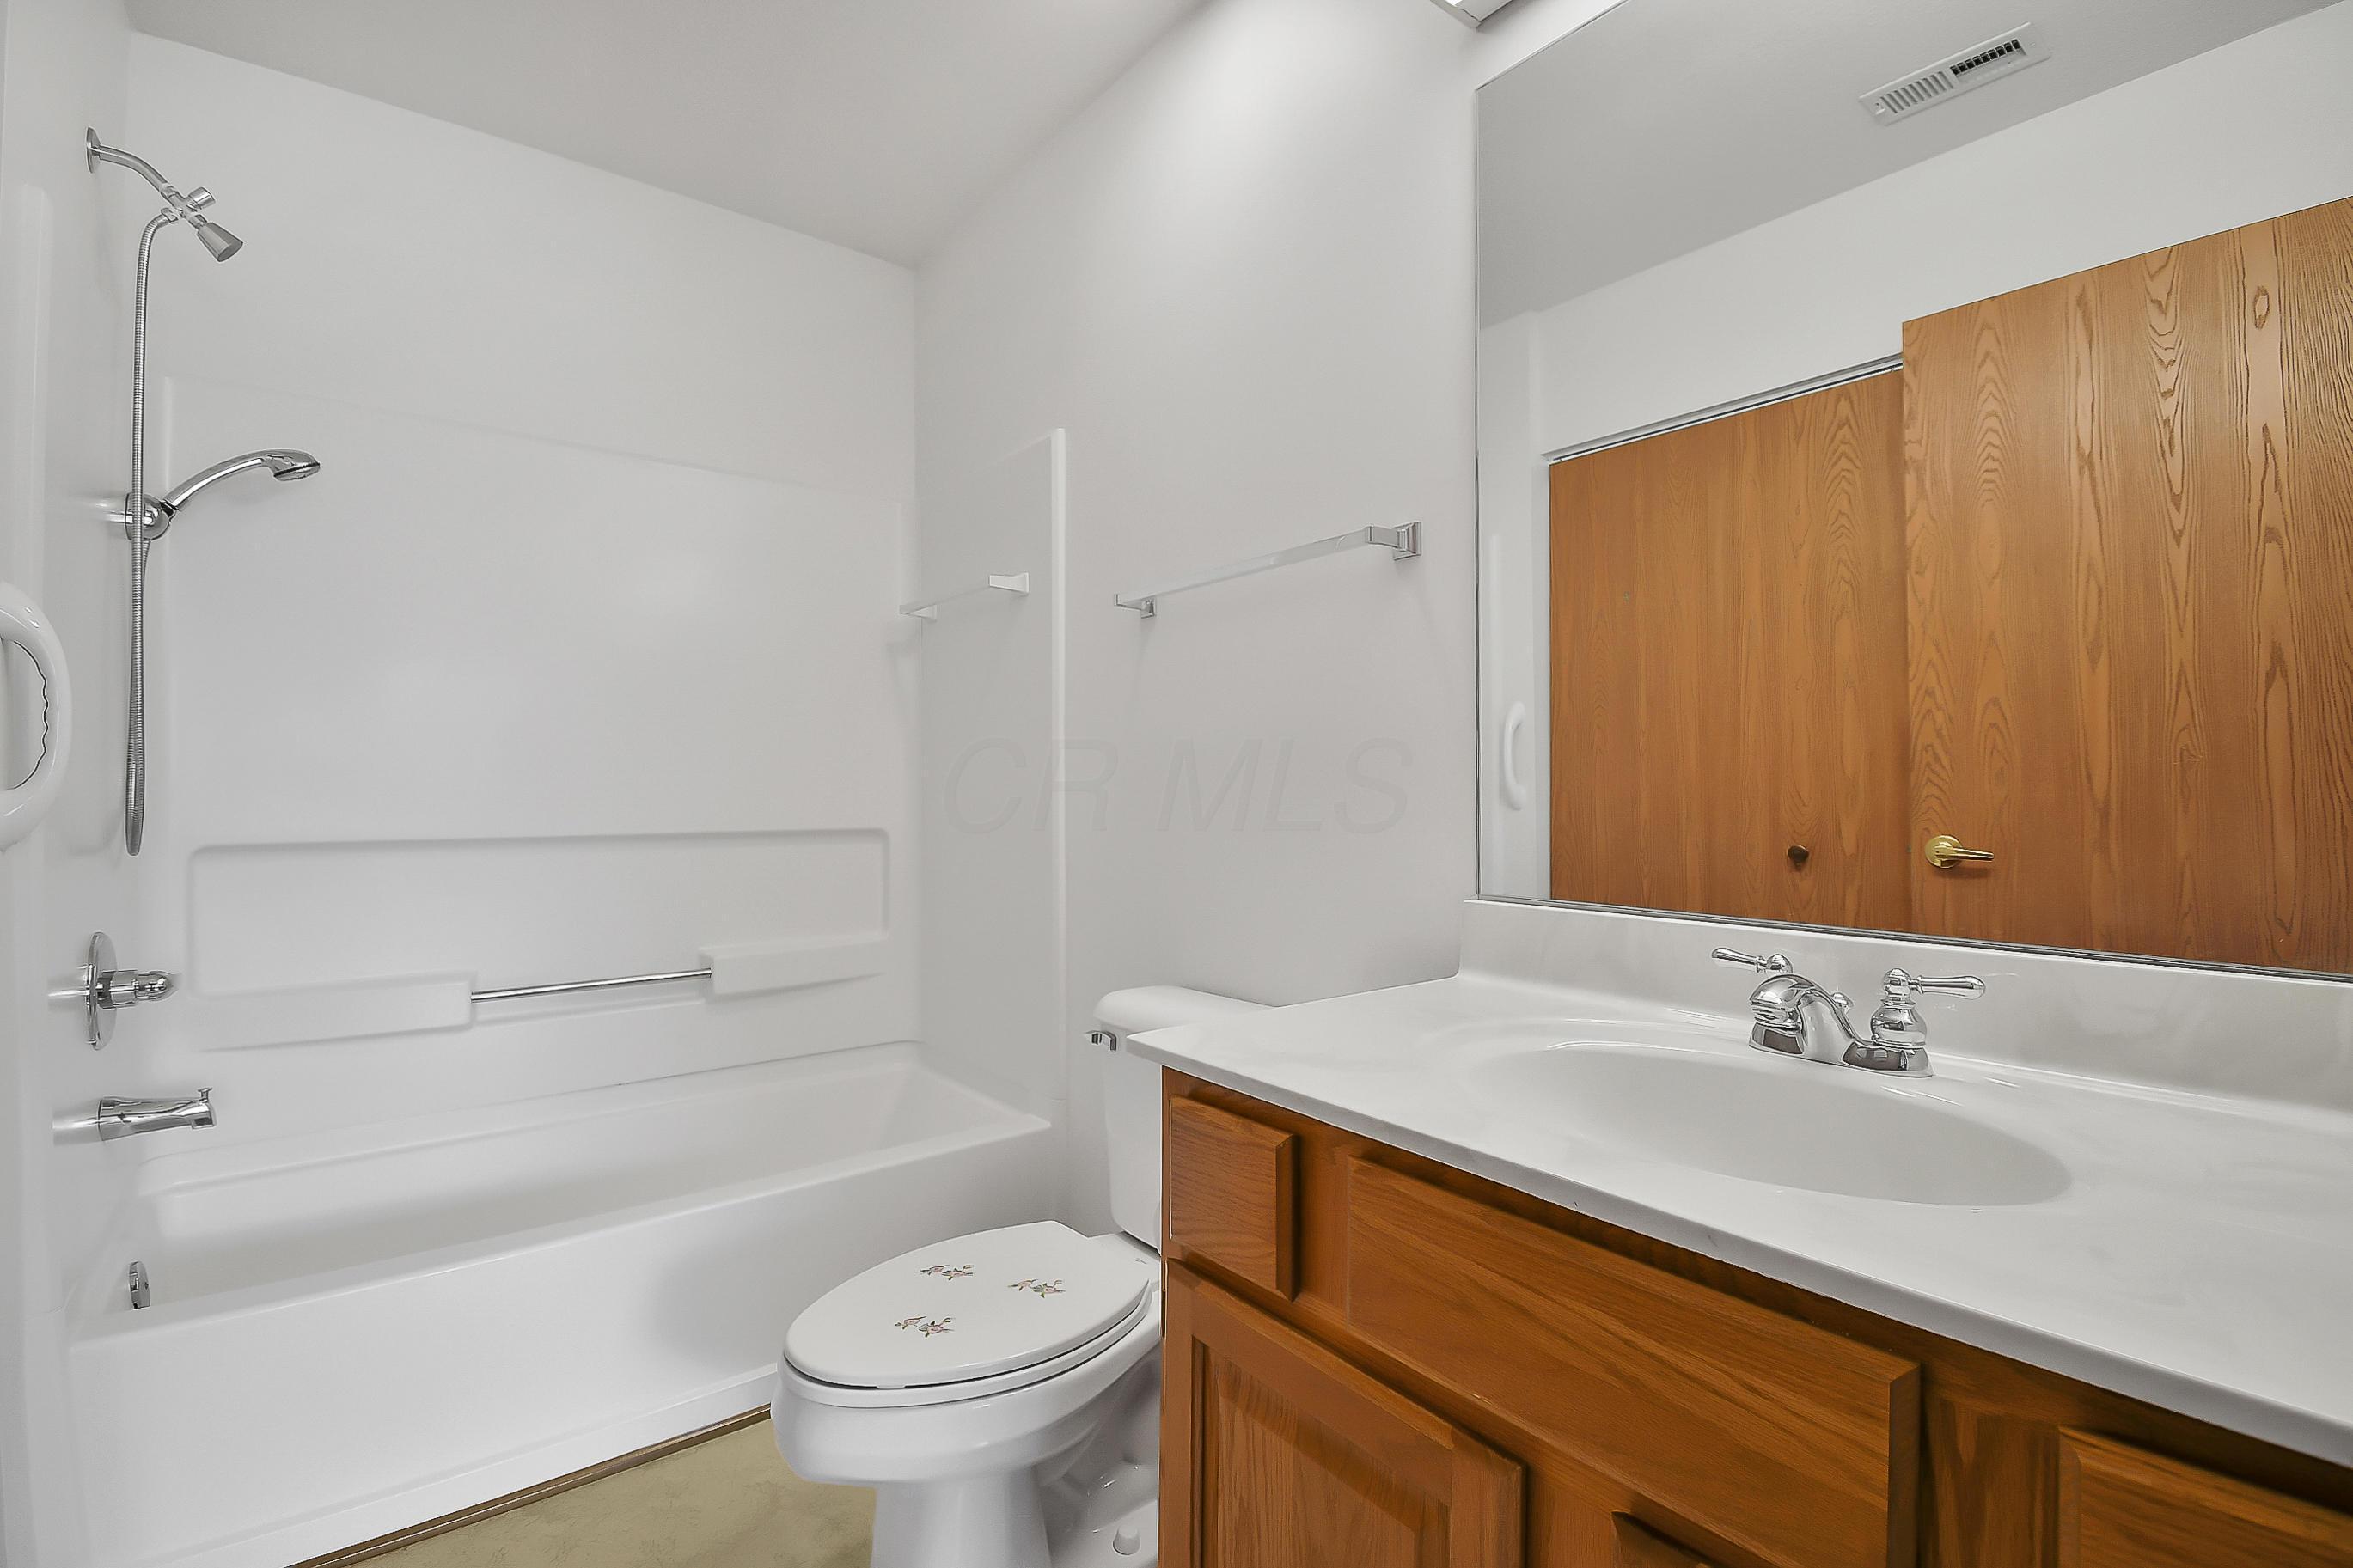 3987 Wiston Drive, Groveport, Ohio 43125, 2 Bedrooms Bedrooms, ,2 BathroomsBathrooms,Residential,For Sale,Wiston,220025823